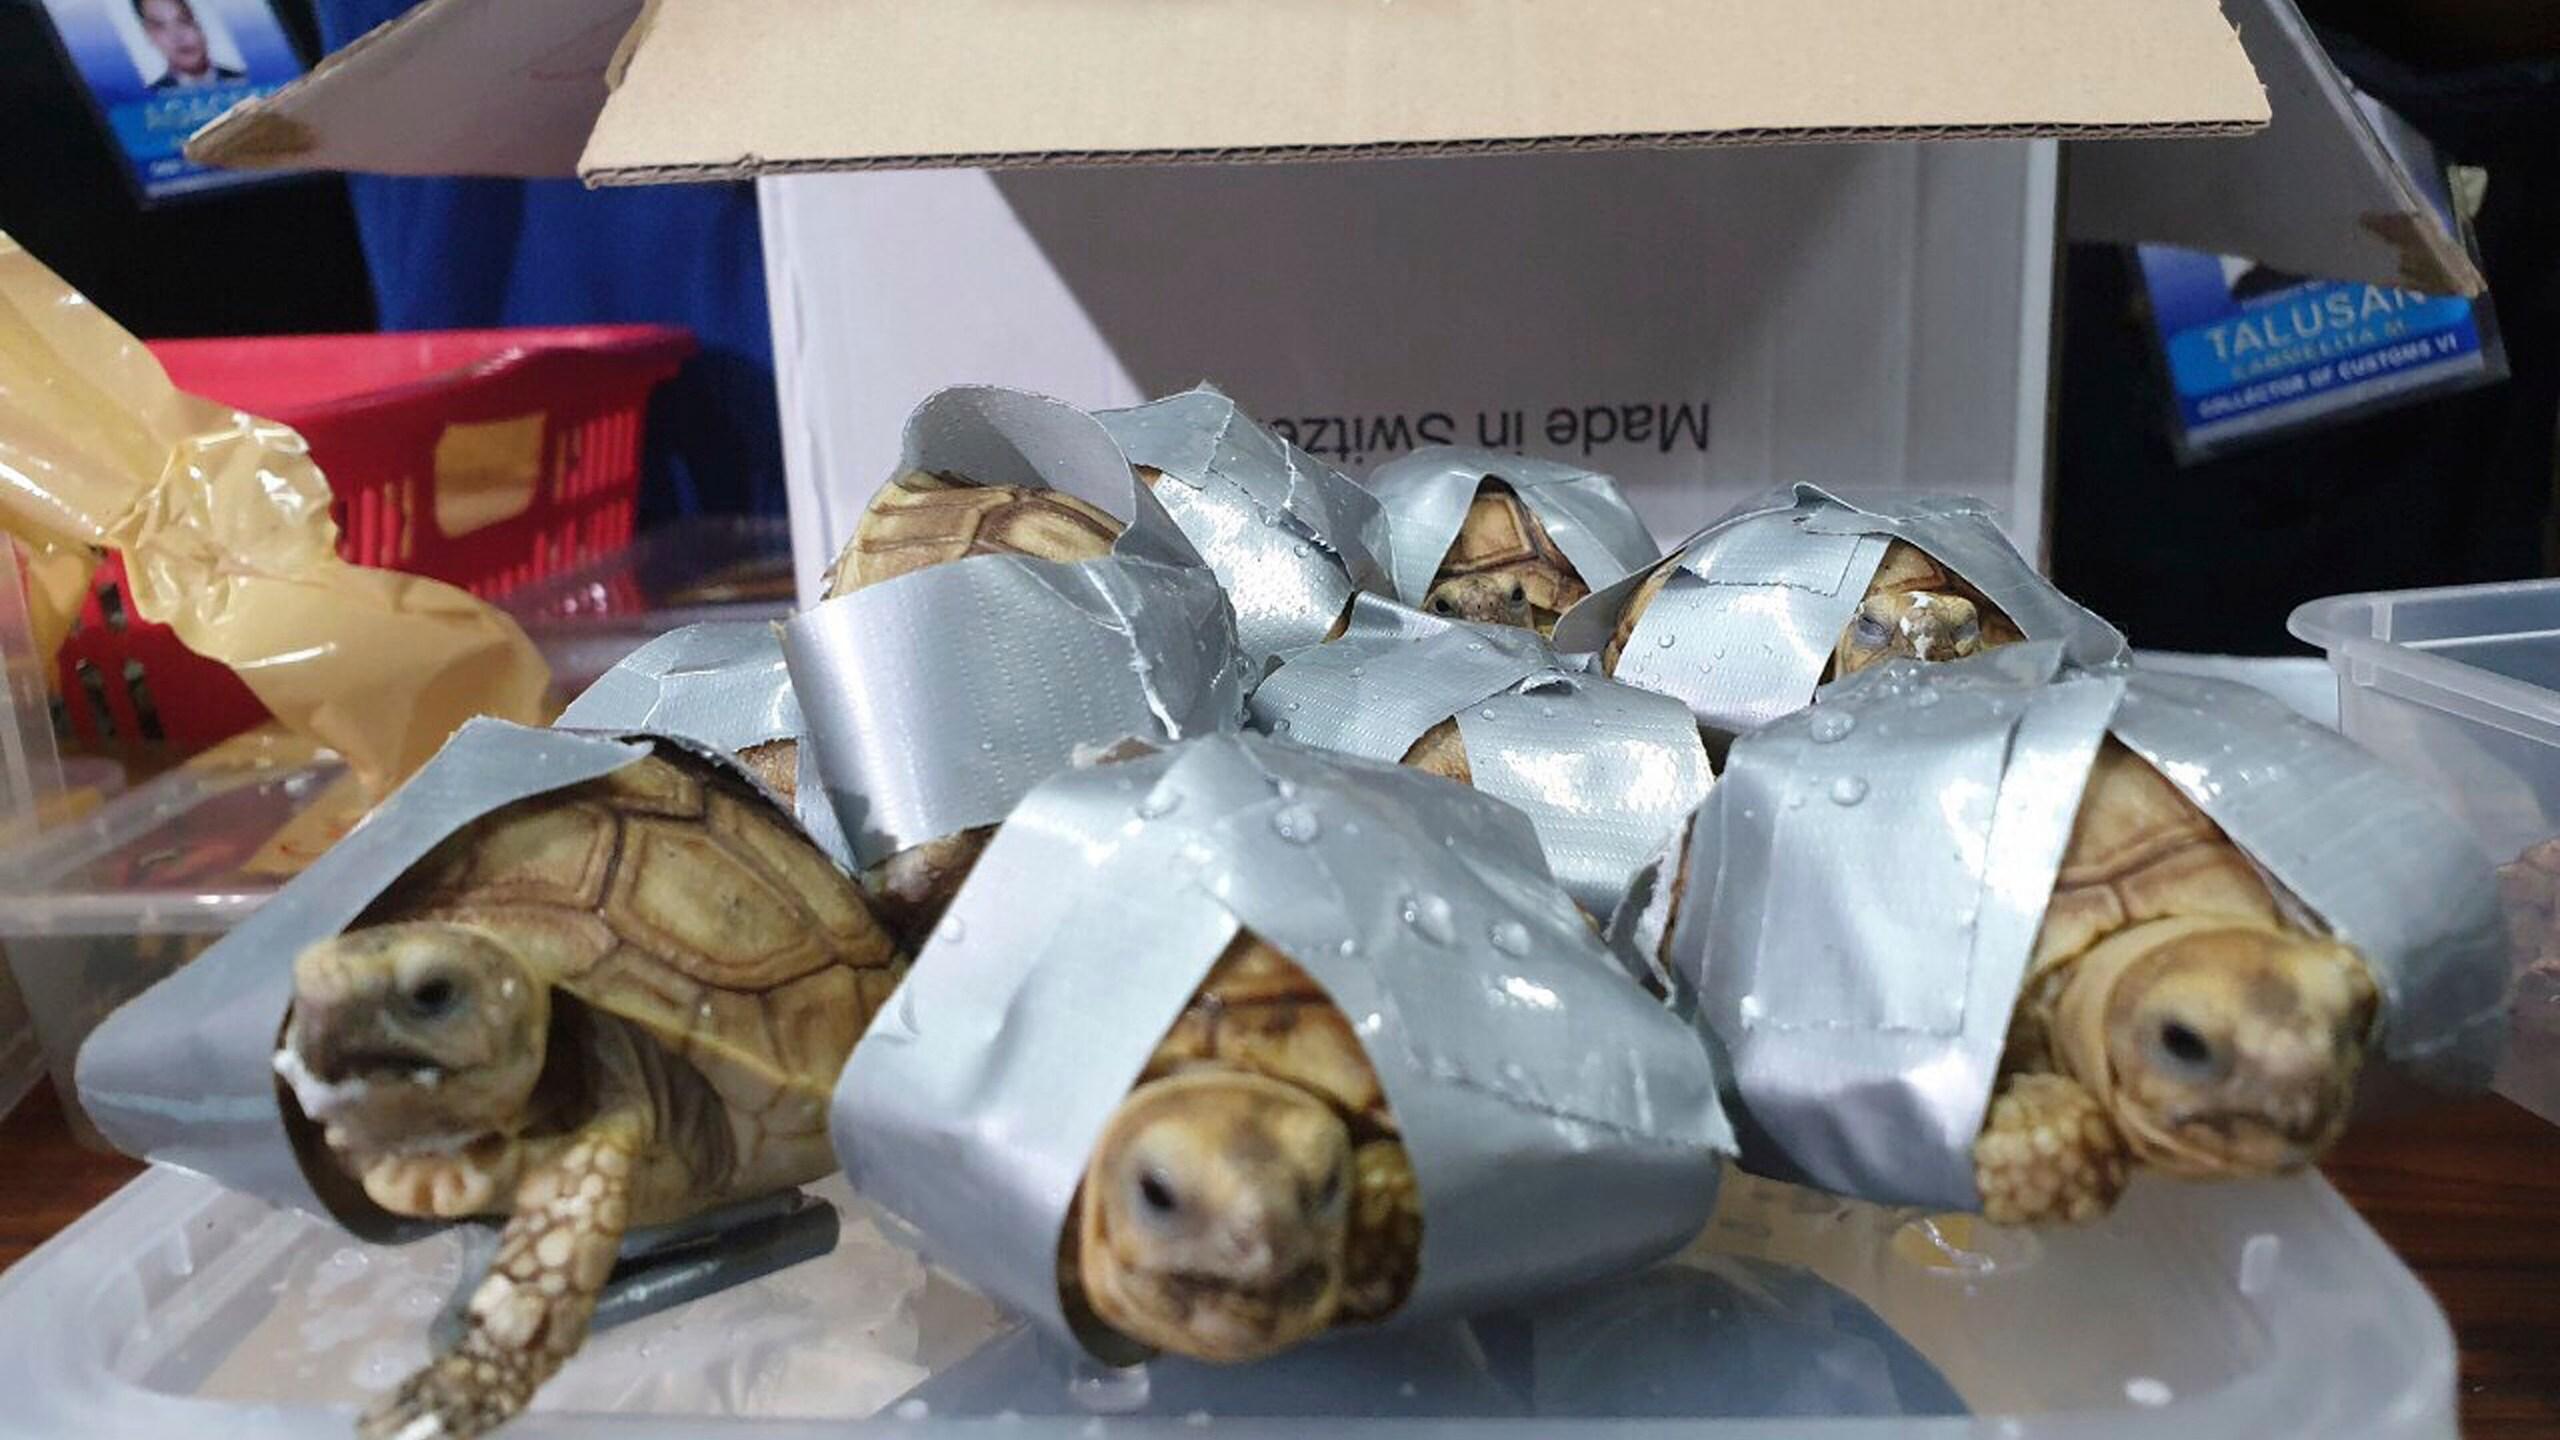 Philippines_Turtles_83196-159532.jpg41116362